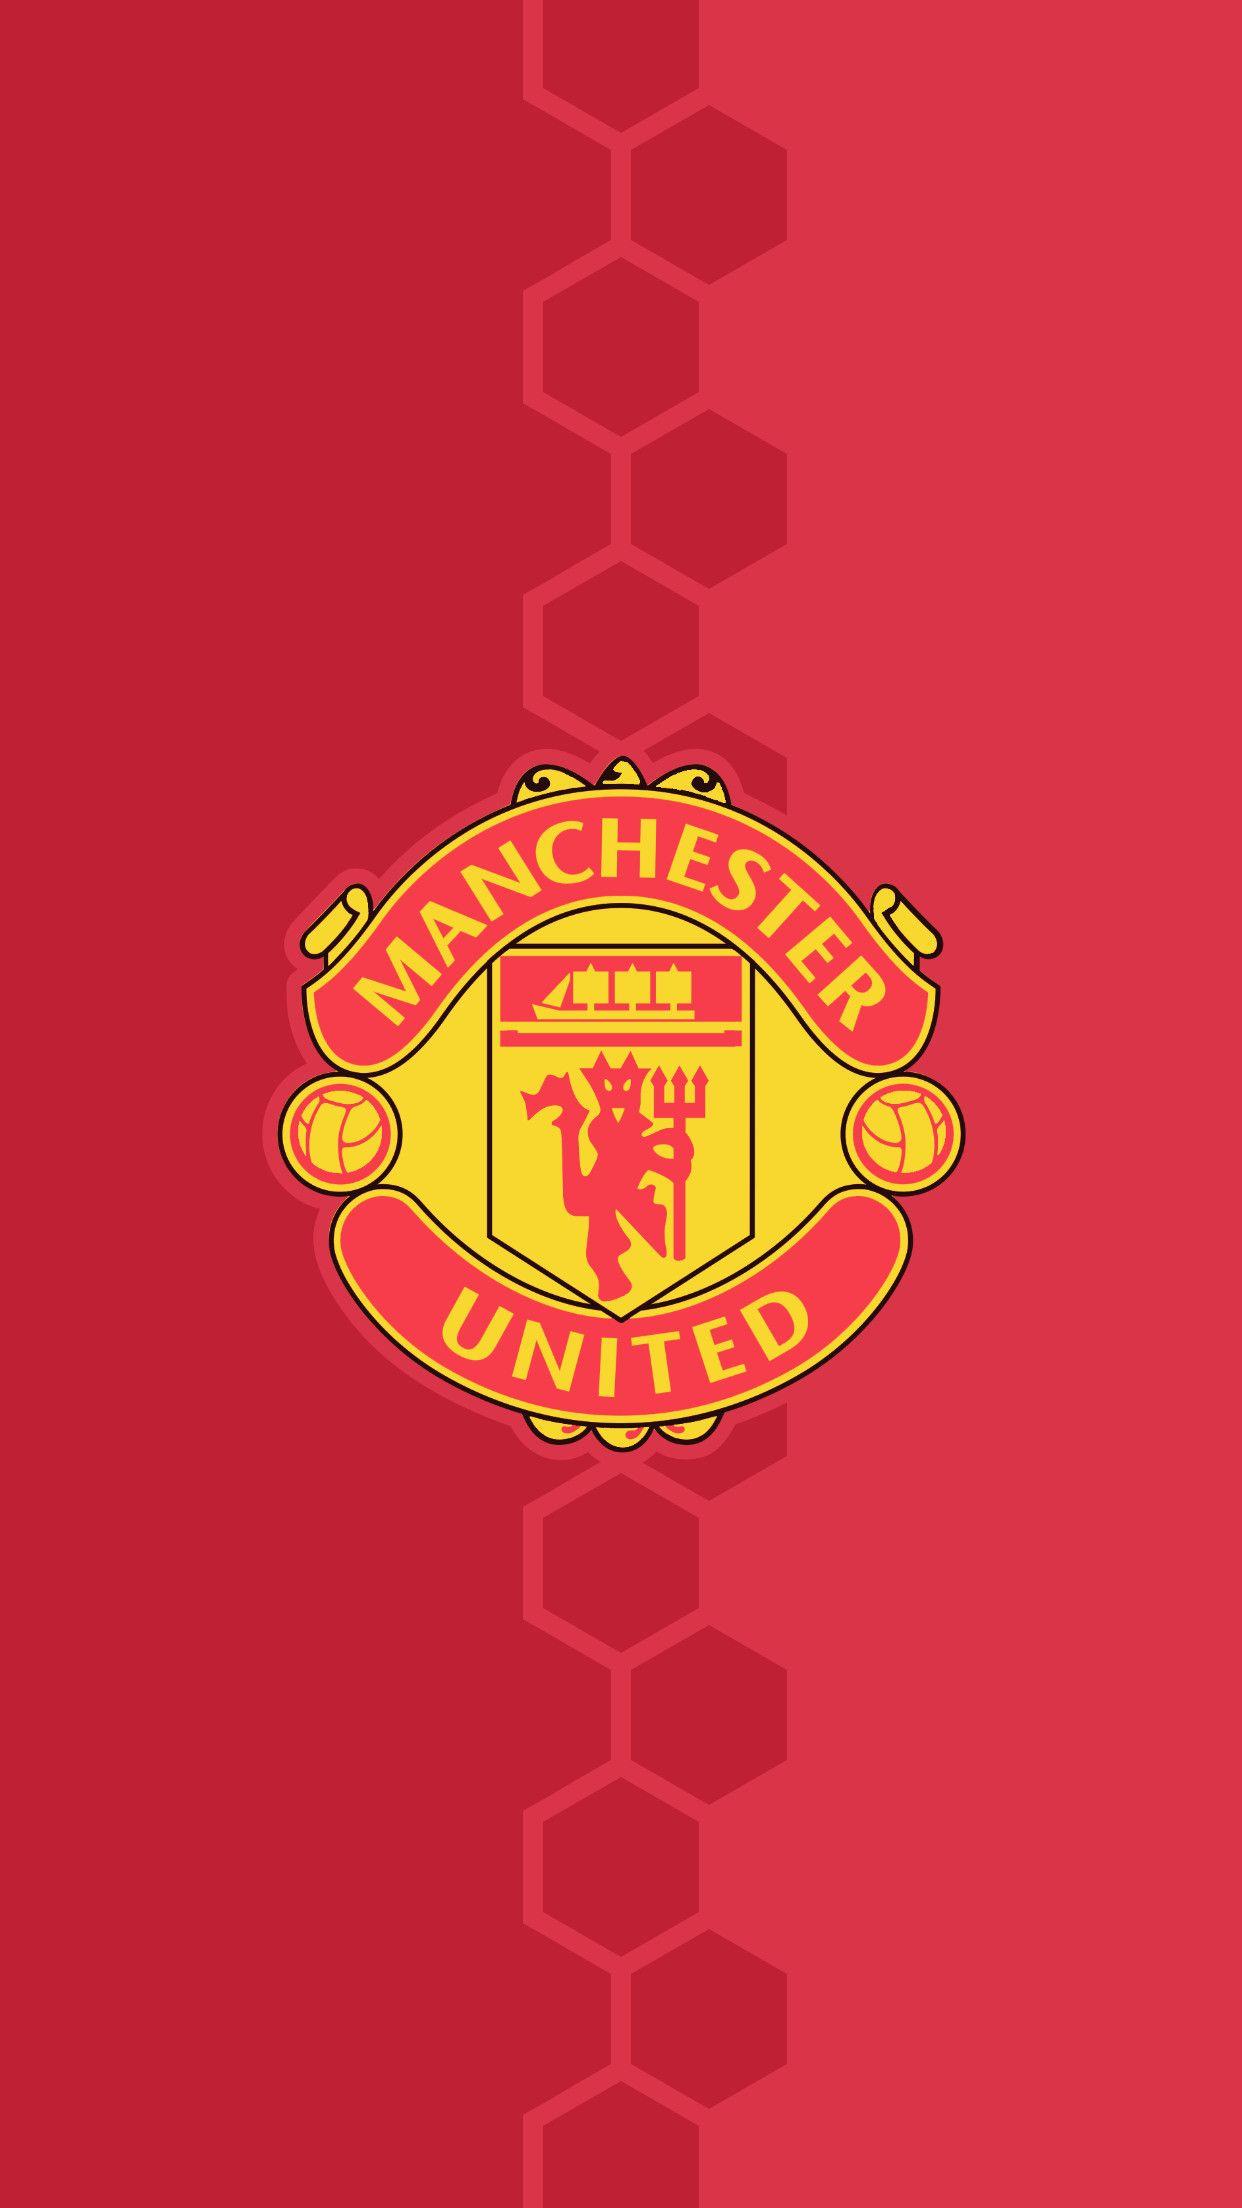 1242x2208 Manchester United Wallpaper Football Wallpaper Man United M Manchester United Wallpaper Manchester United Wallpapers Iphone Manchester United Logo